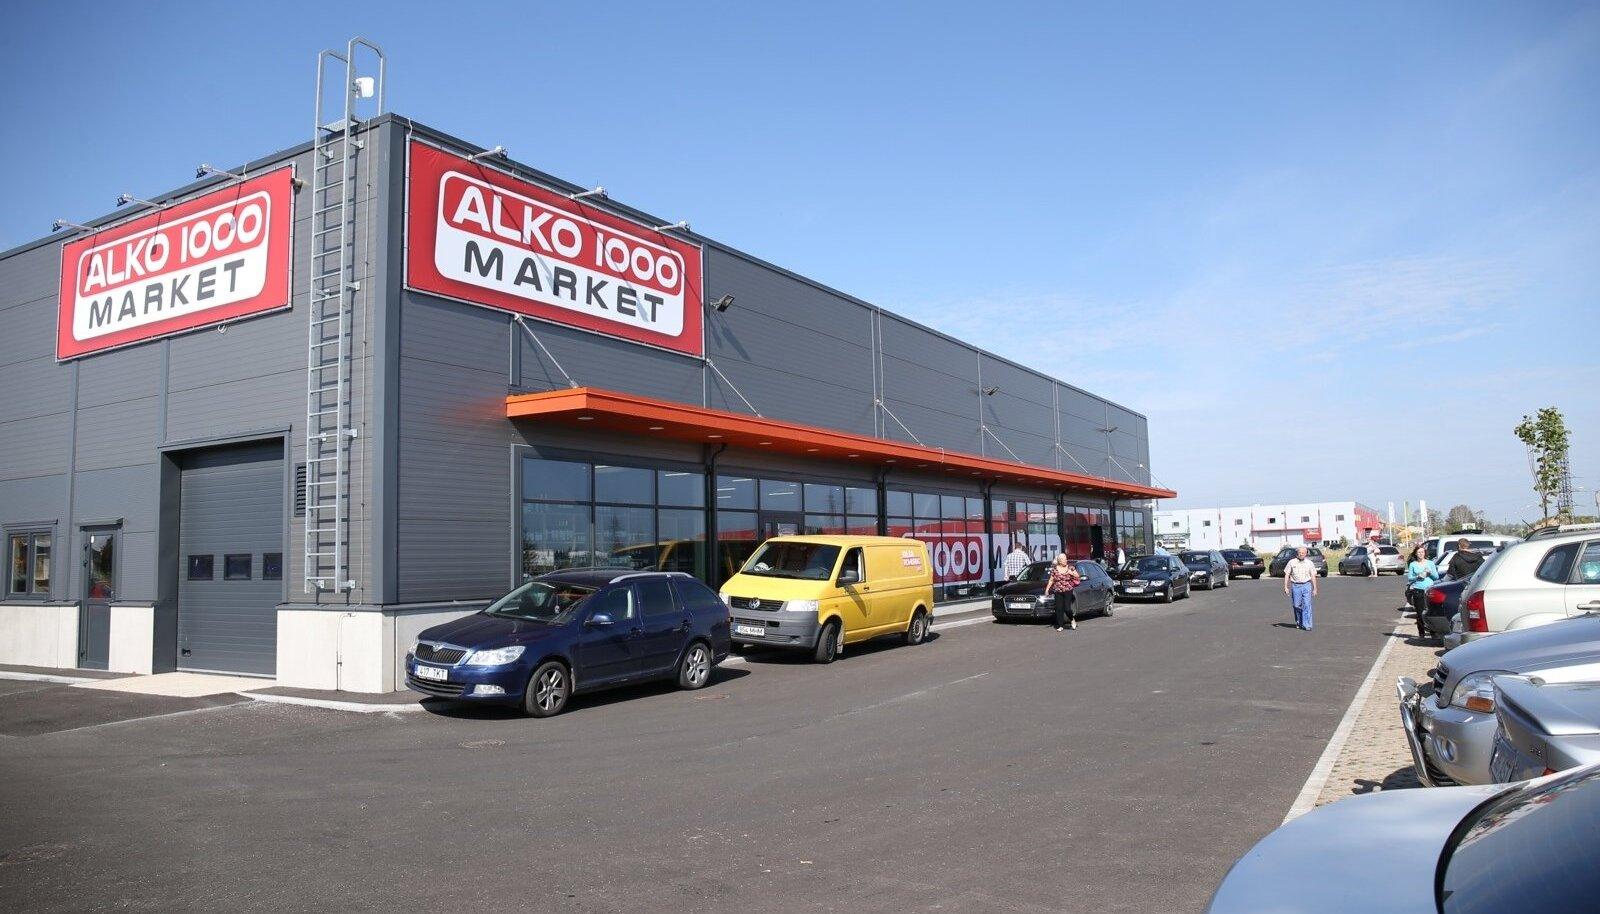 Alko 1000 Market Tartus